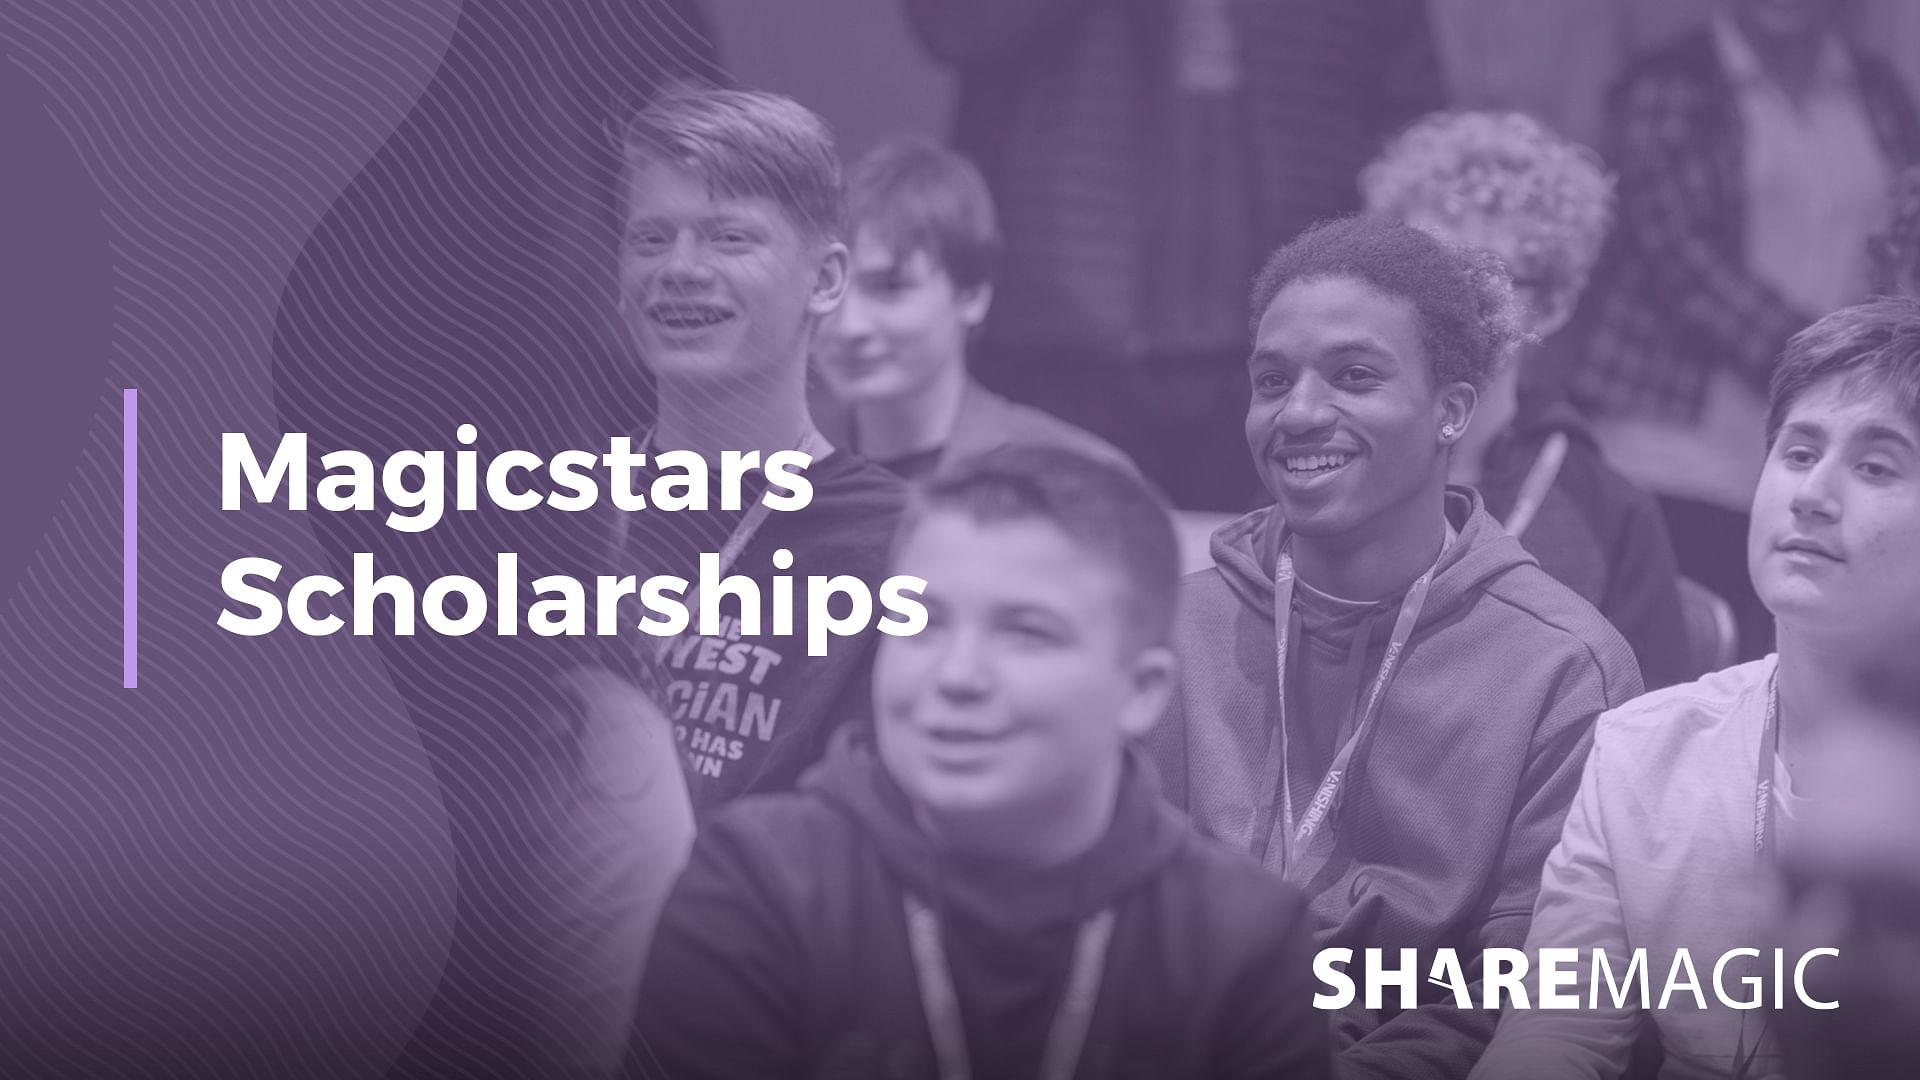 MagicStars Scholarships